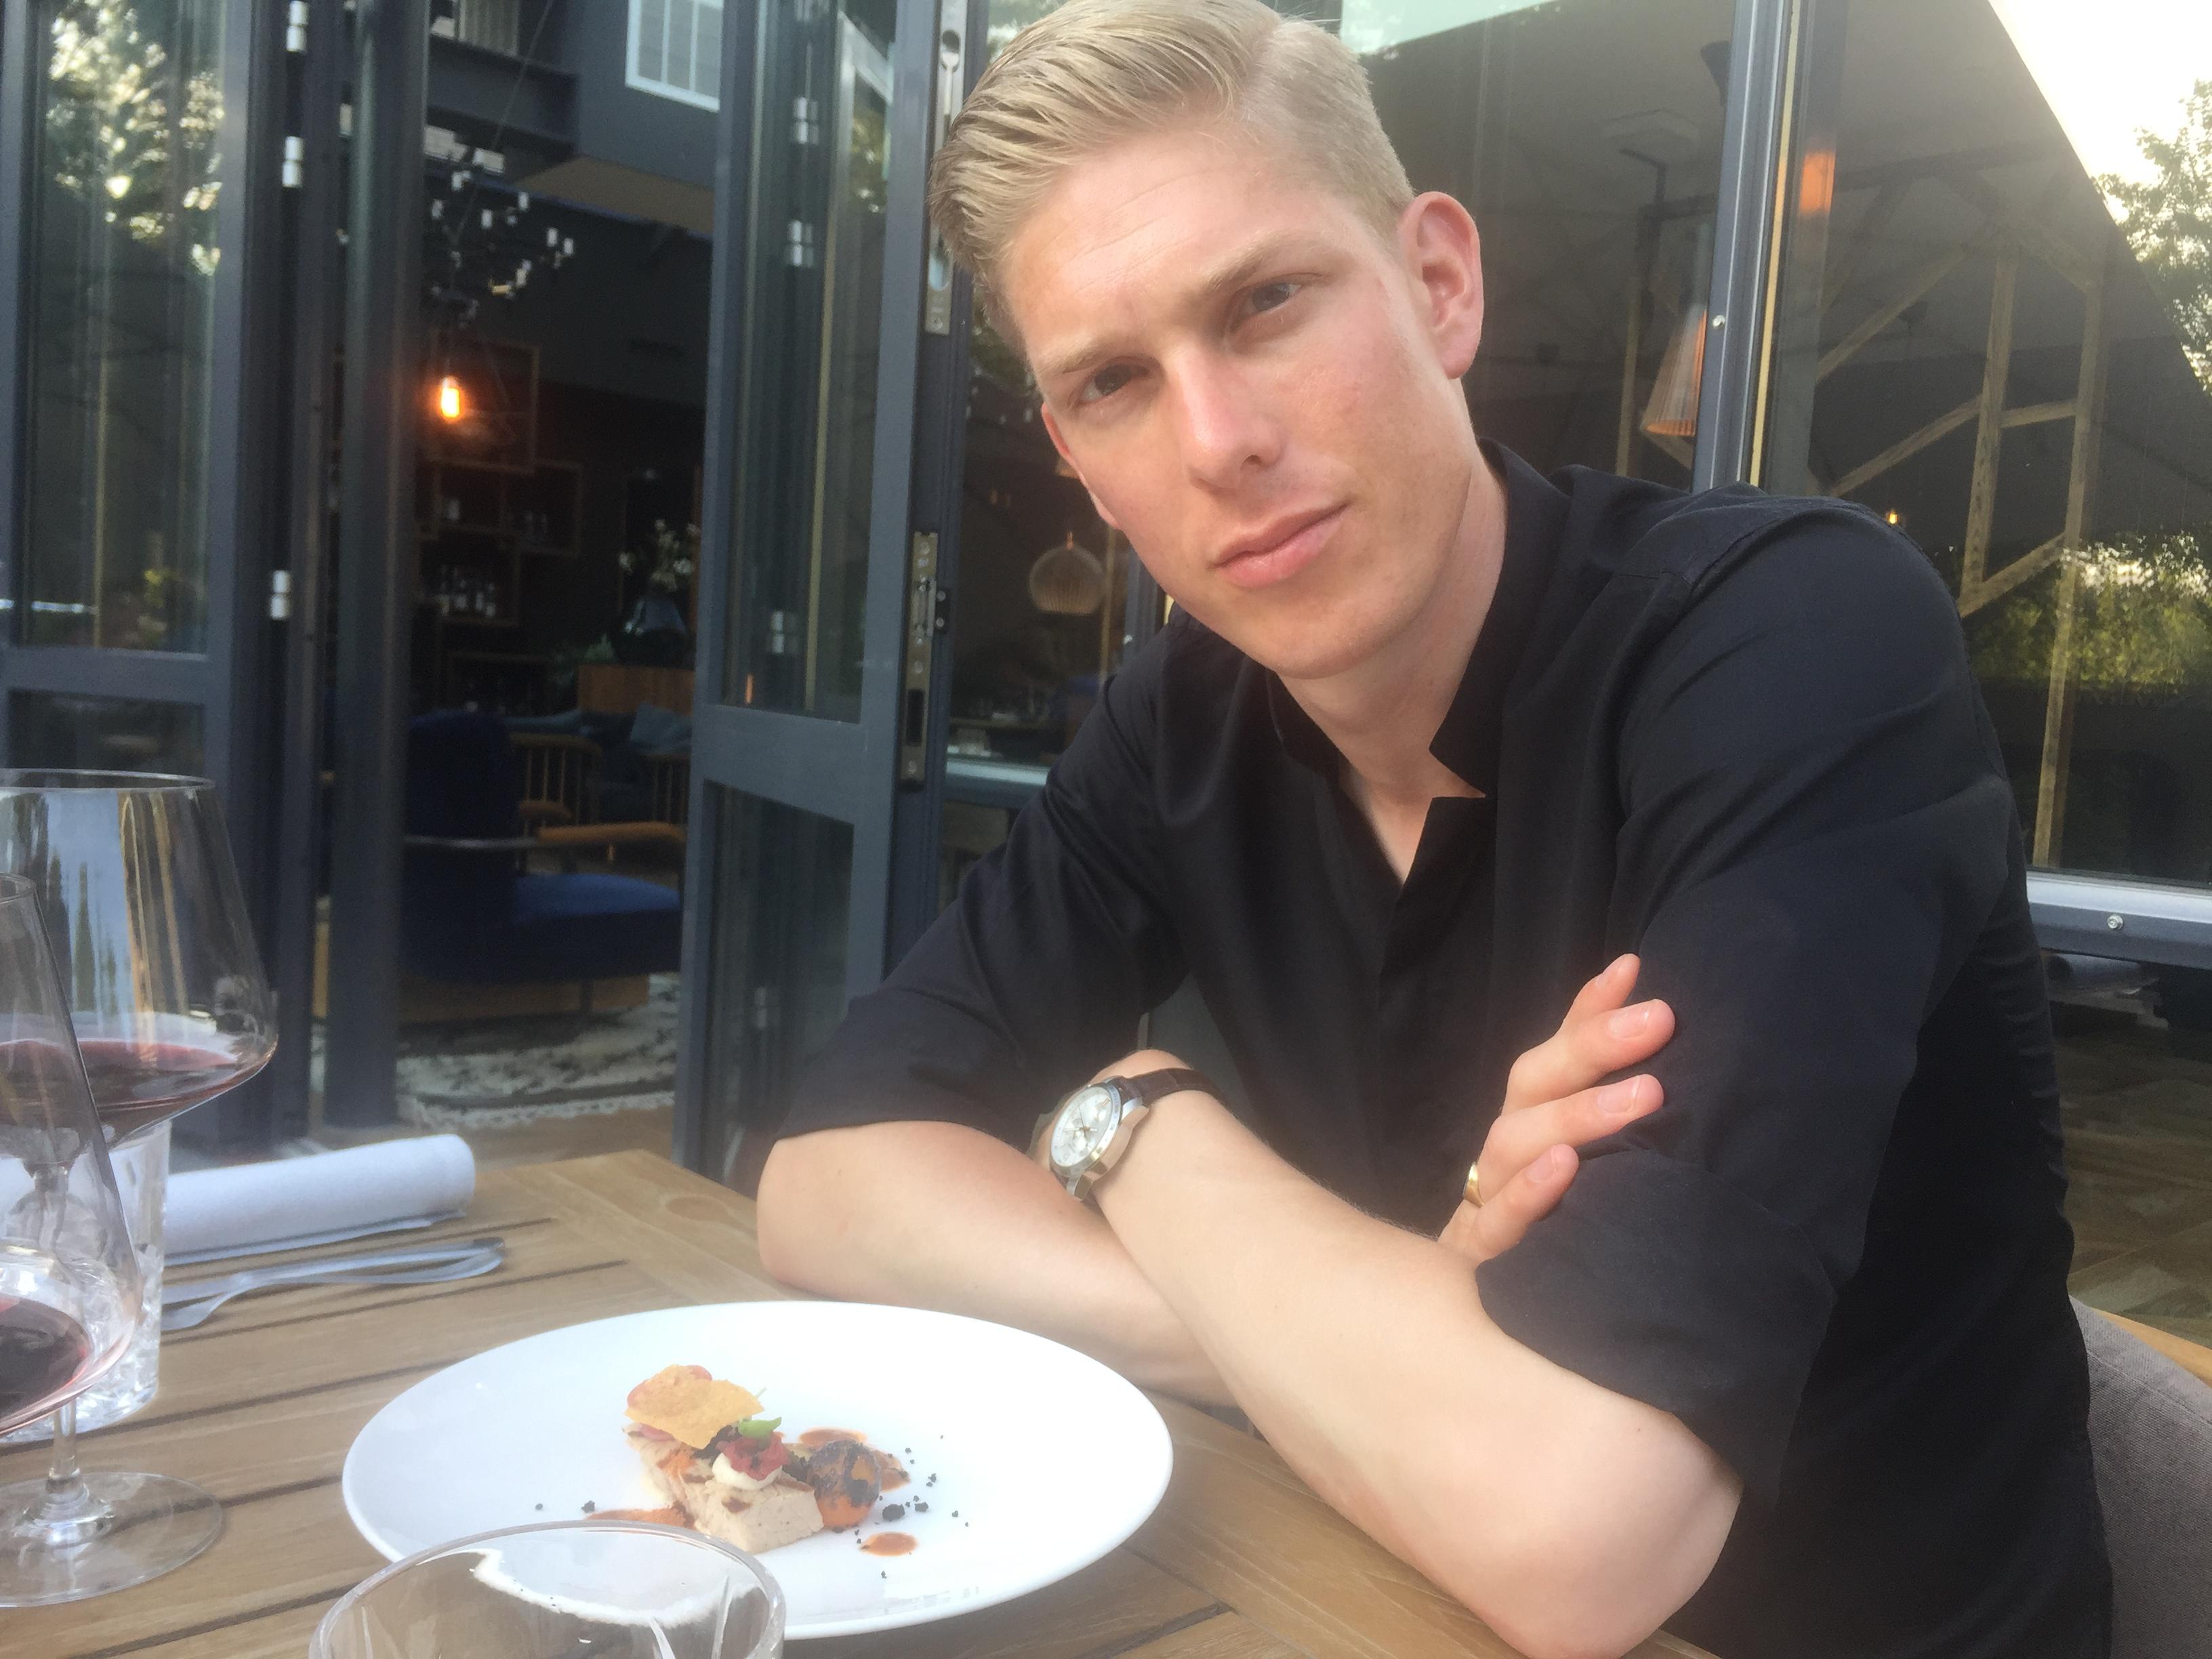 Steven van Roemburg